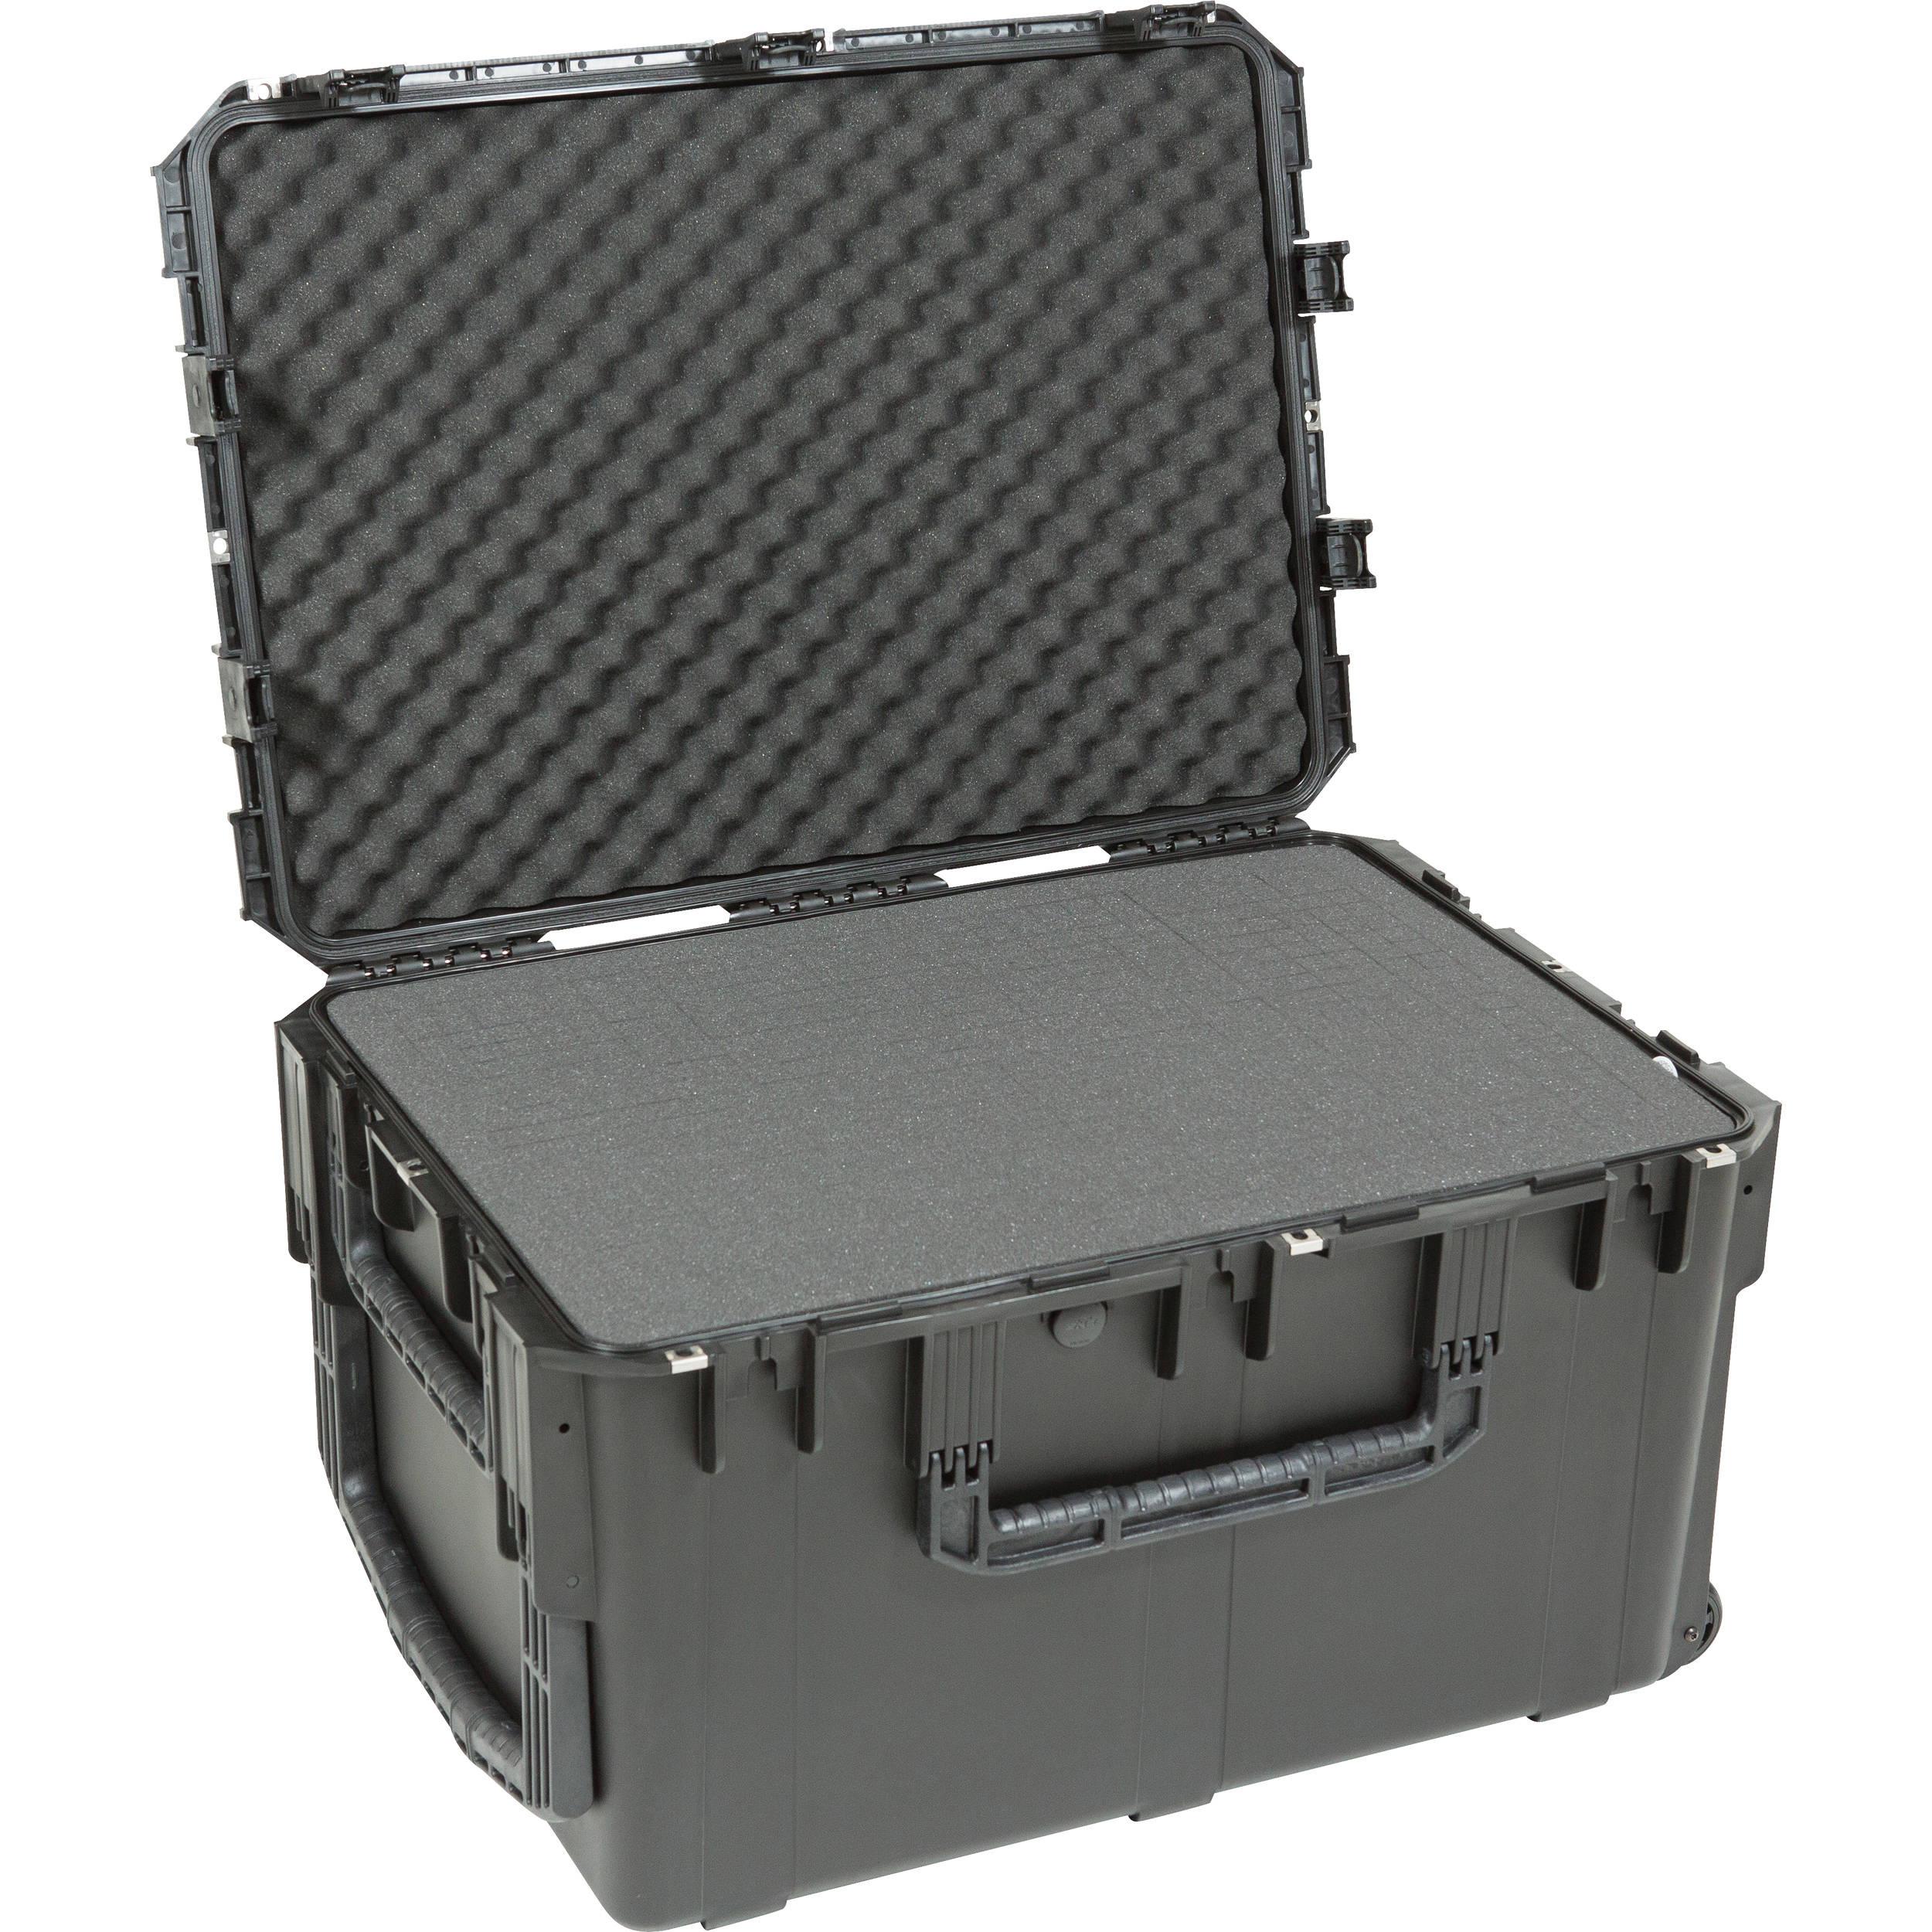 SKB iSeries 3021-18 Waterproof Utility Case with Cubed Foam